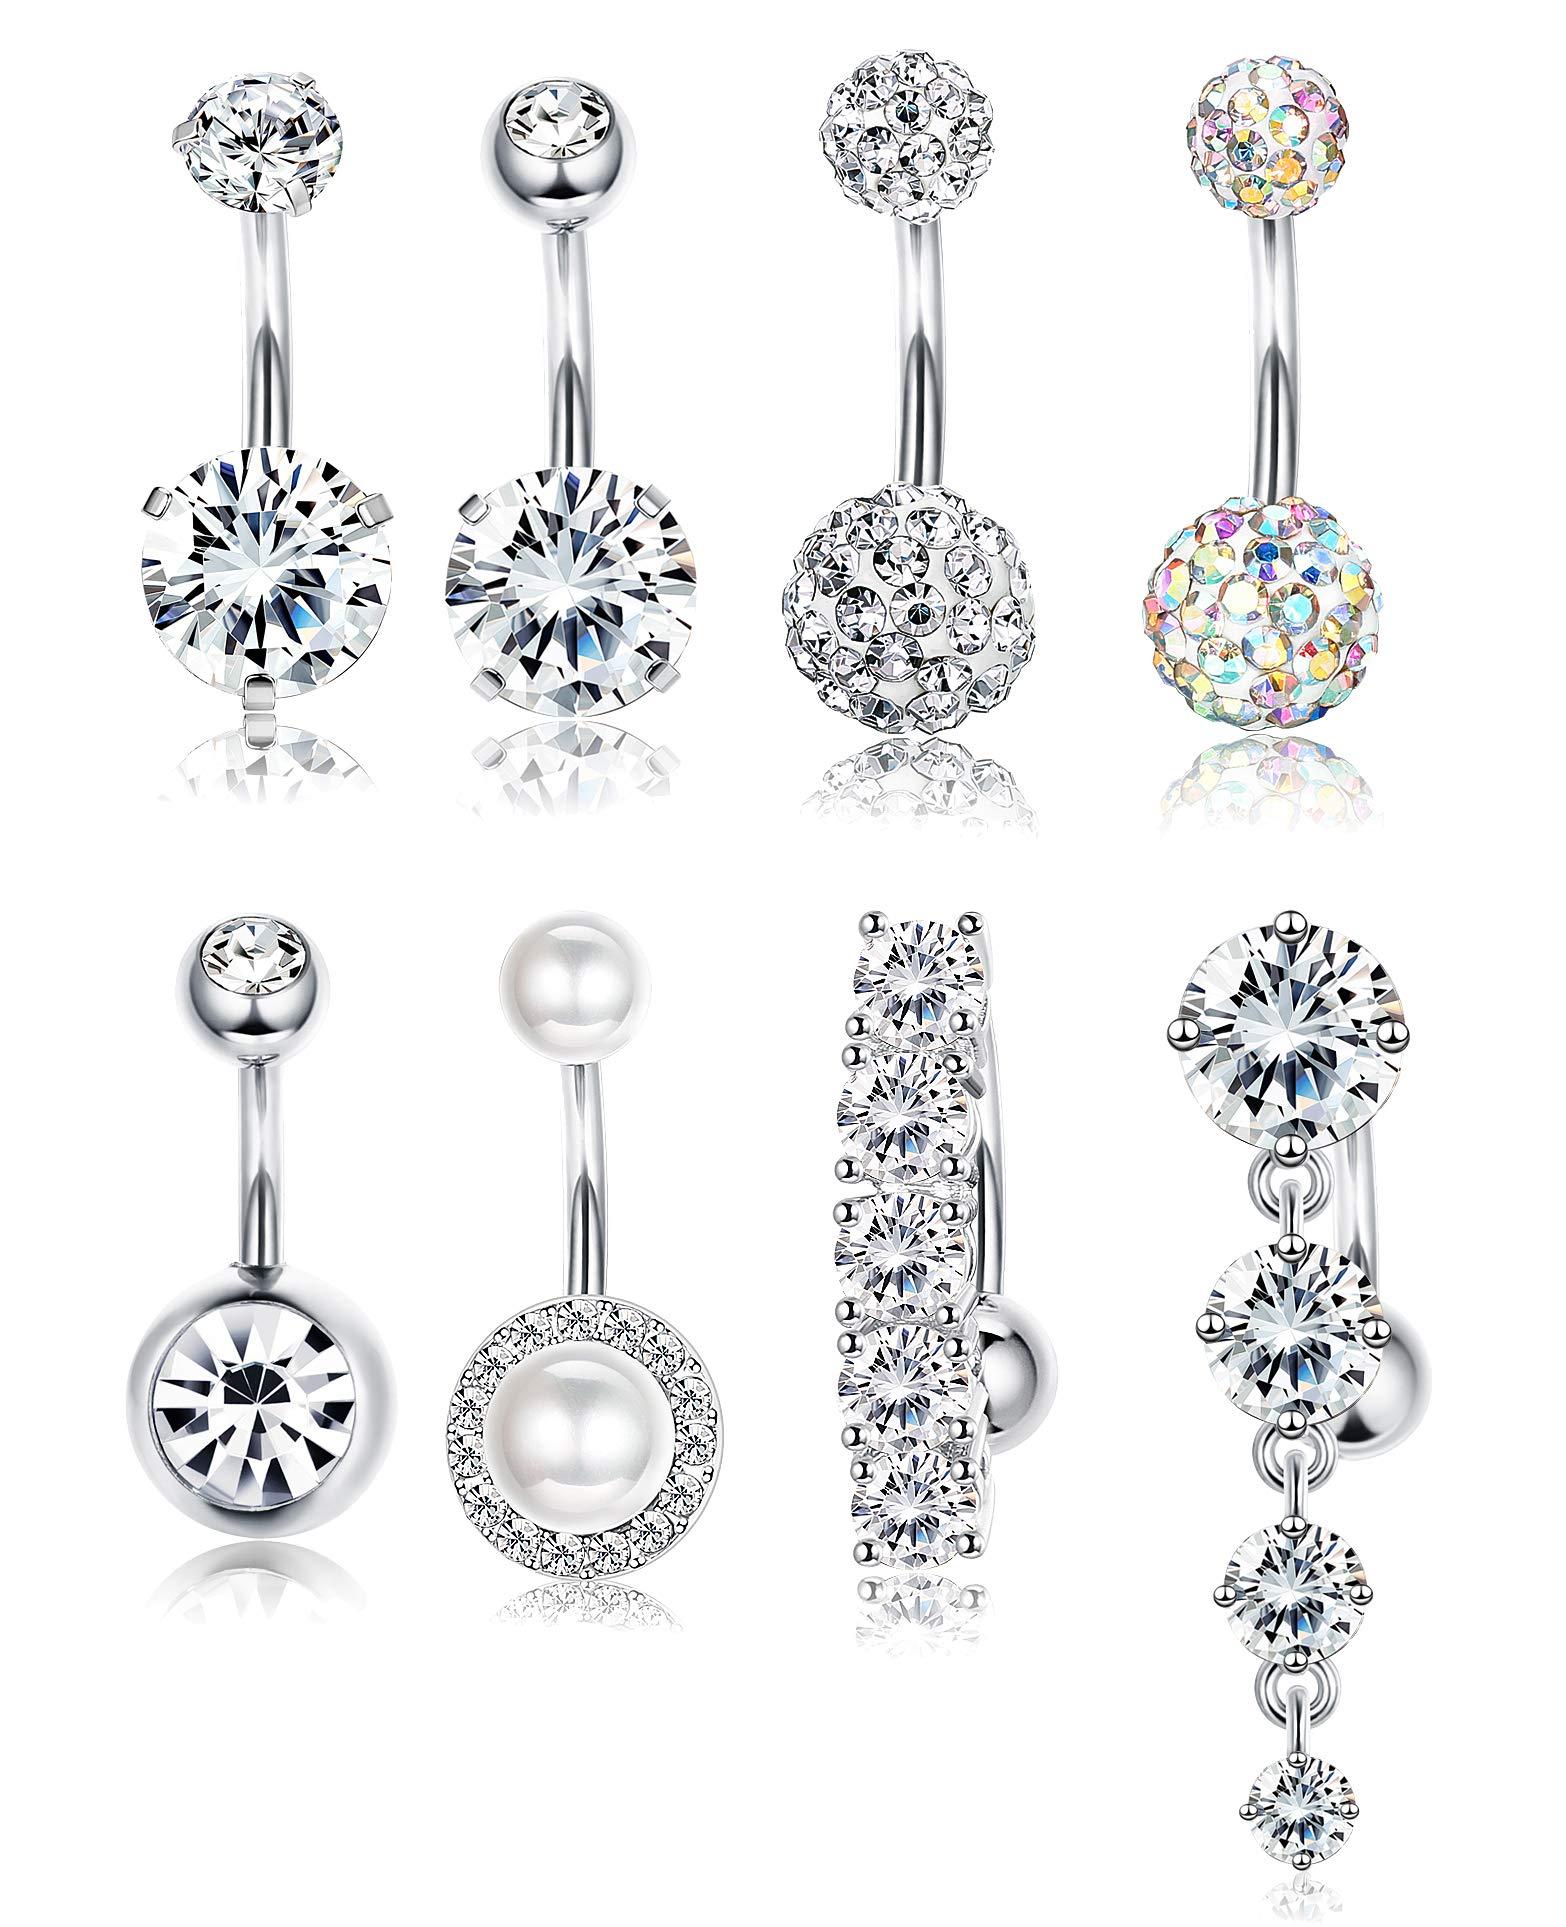 Udalyn 8pcs Belly Button Rings for Women Girls Dangle Ball Navel Rings Body Jewelry Piercing 14G by Udalyn